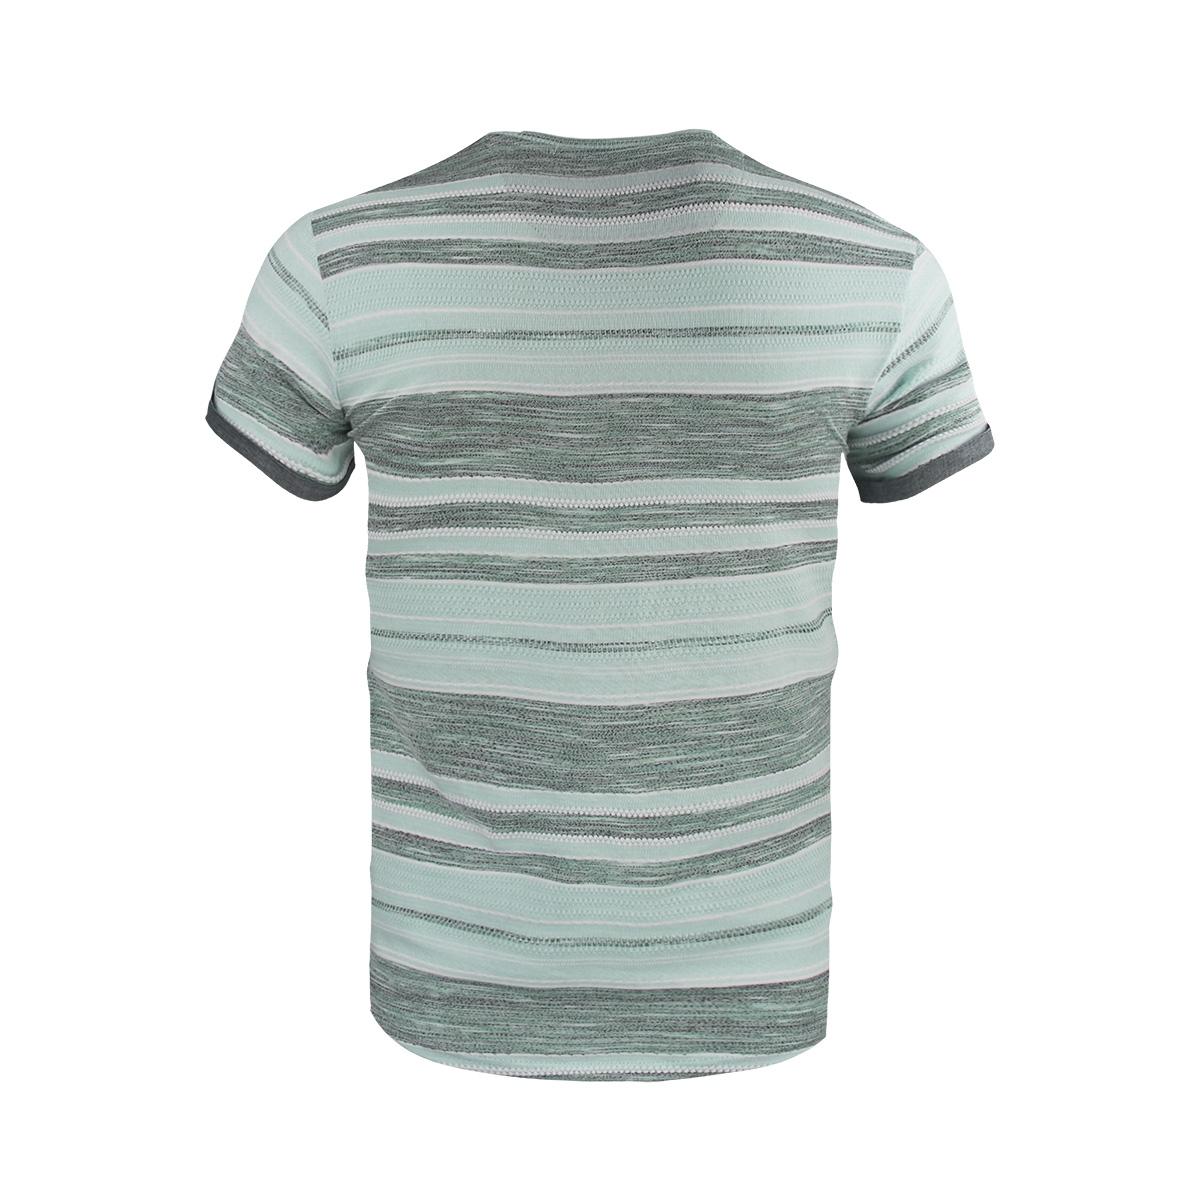 15122 gabbiano t-shirt blue